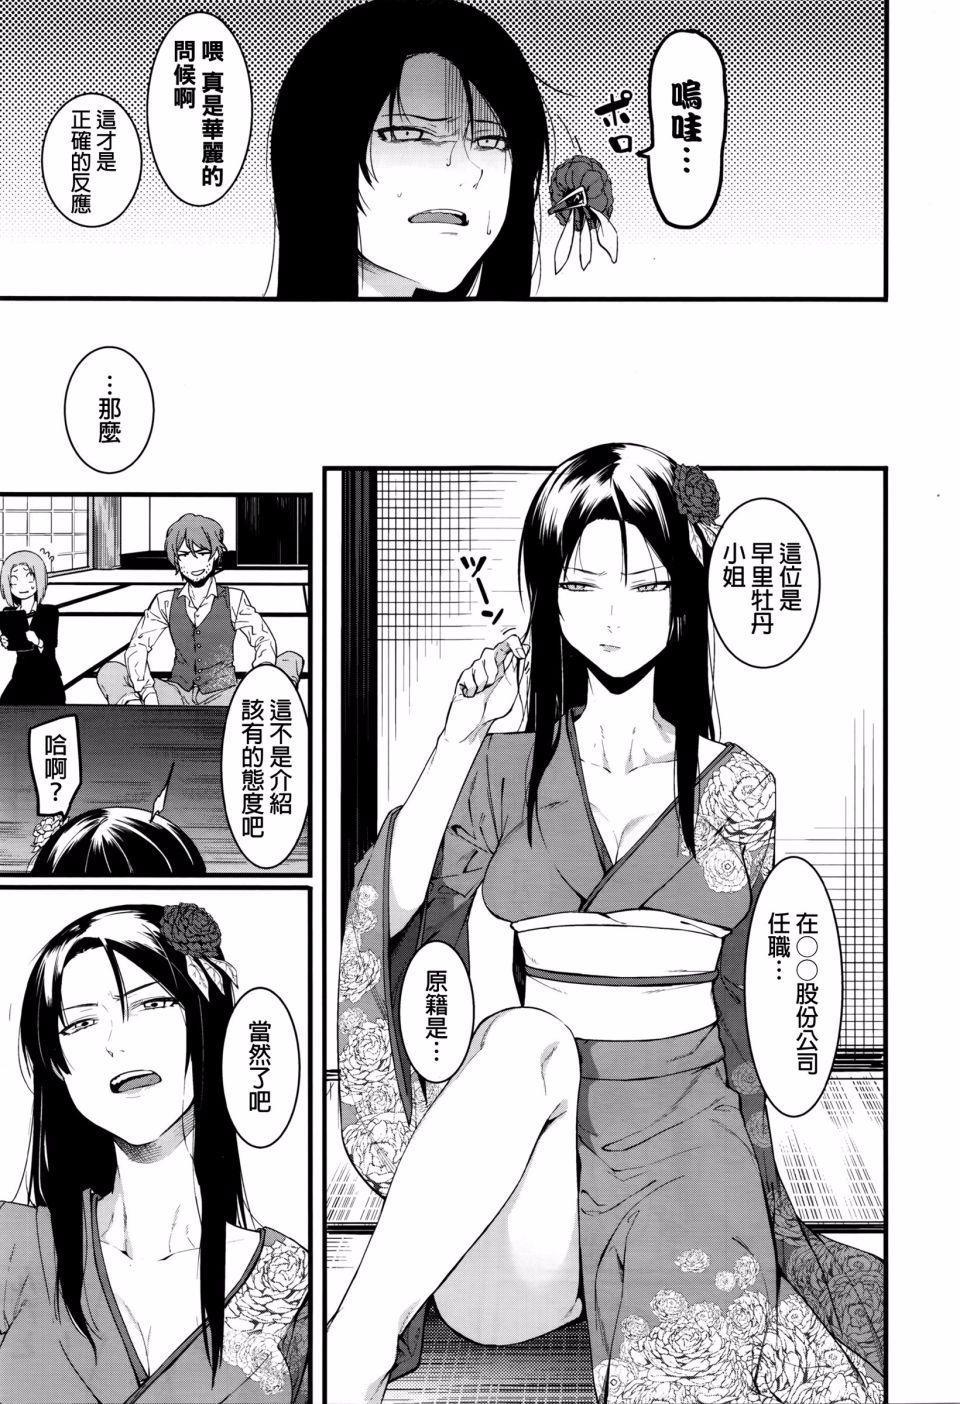 Fukurai Re to leftovers 2